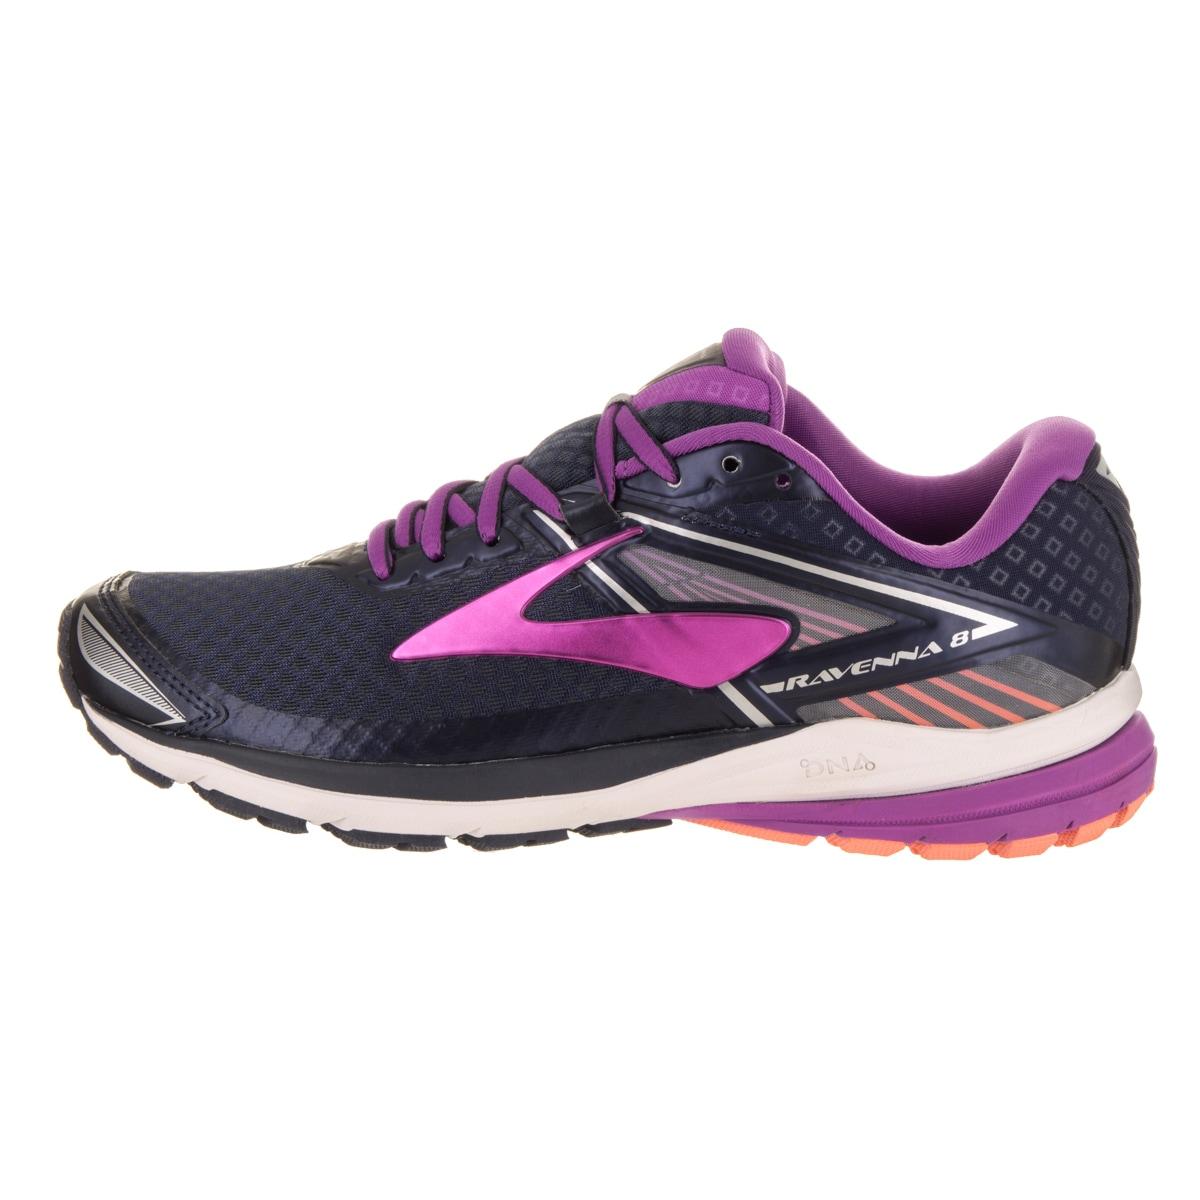 02c7a00c272 Shop Brooks Women s Ravenna 8 Running Shoe - Free Shipping Today -  Overstock - 14972882